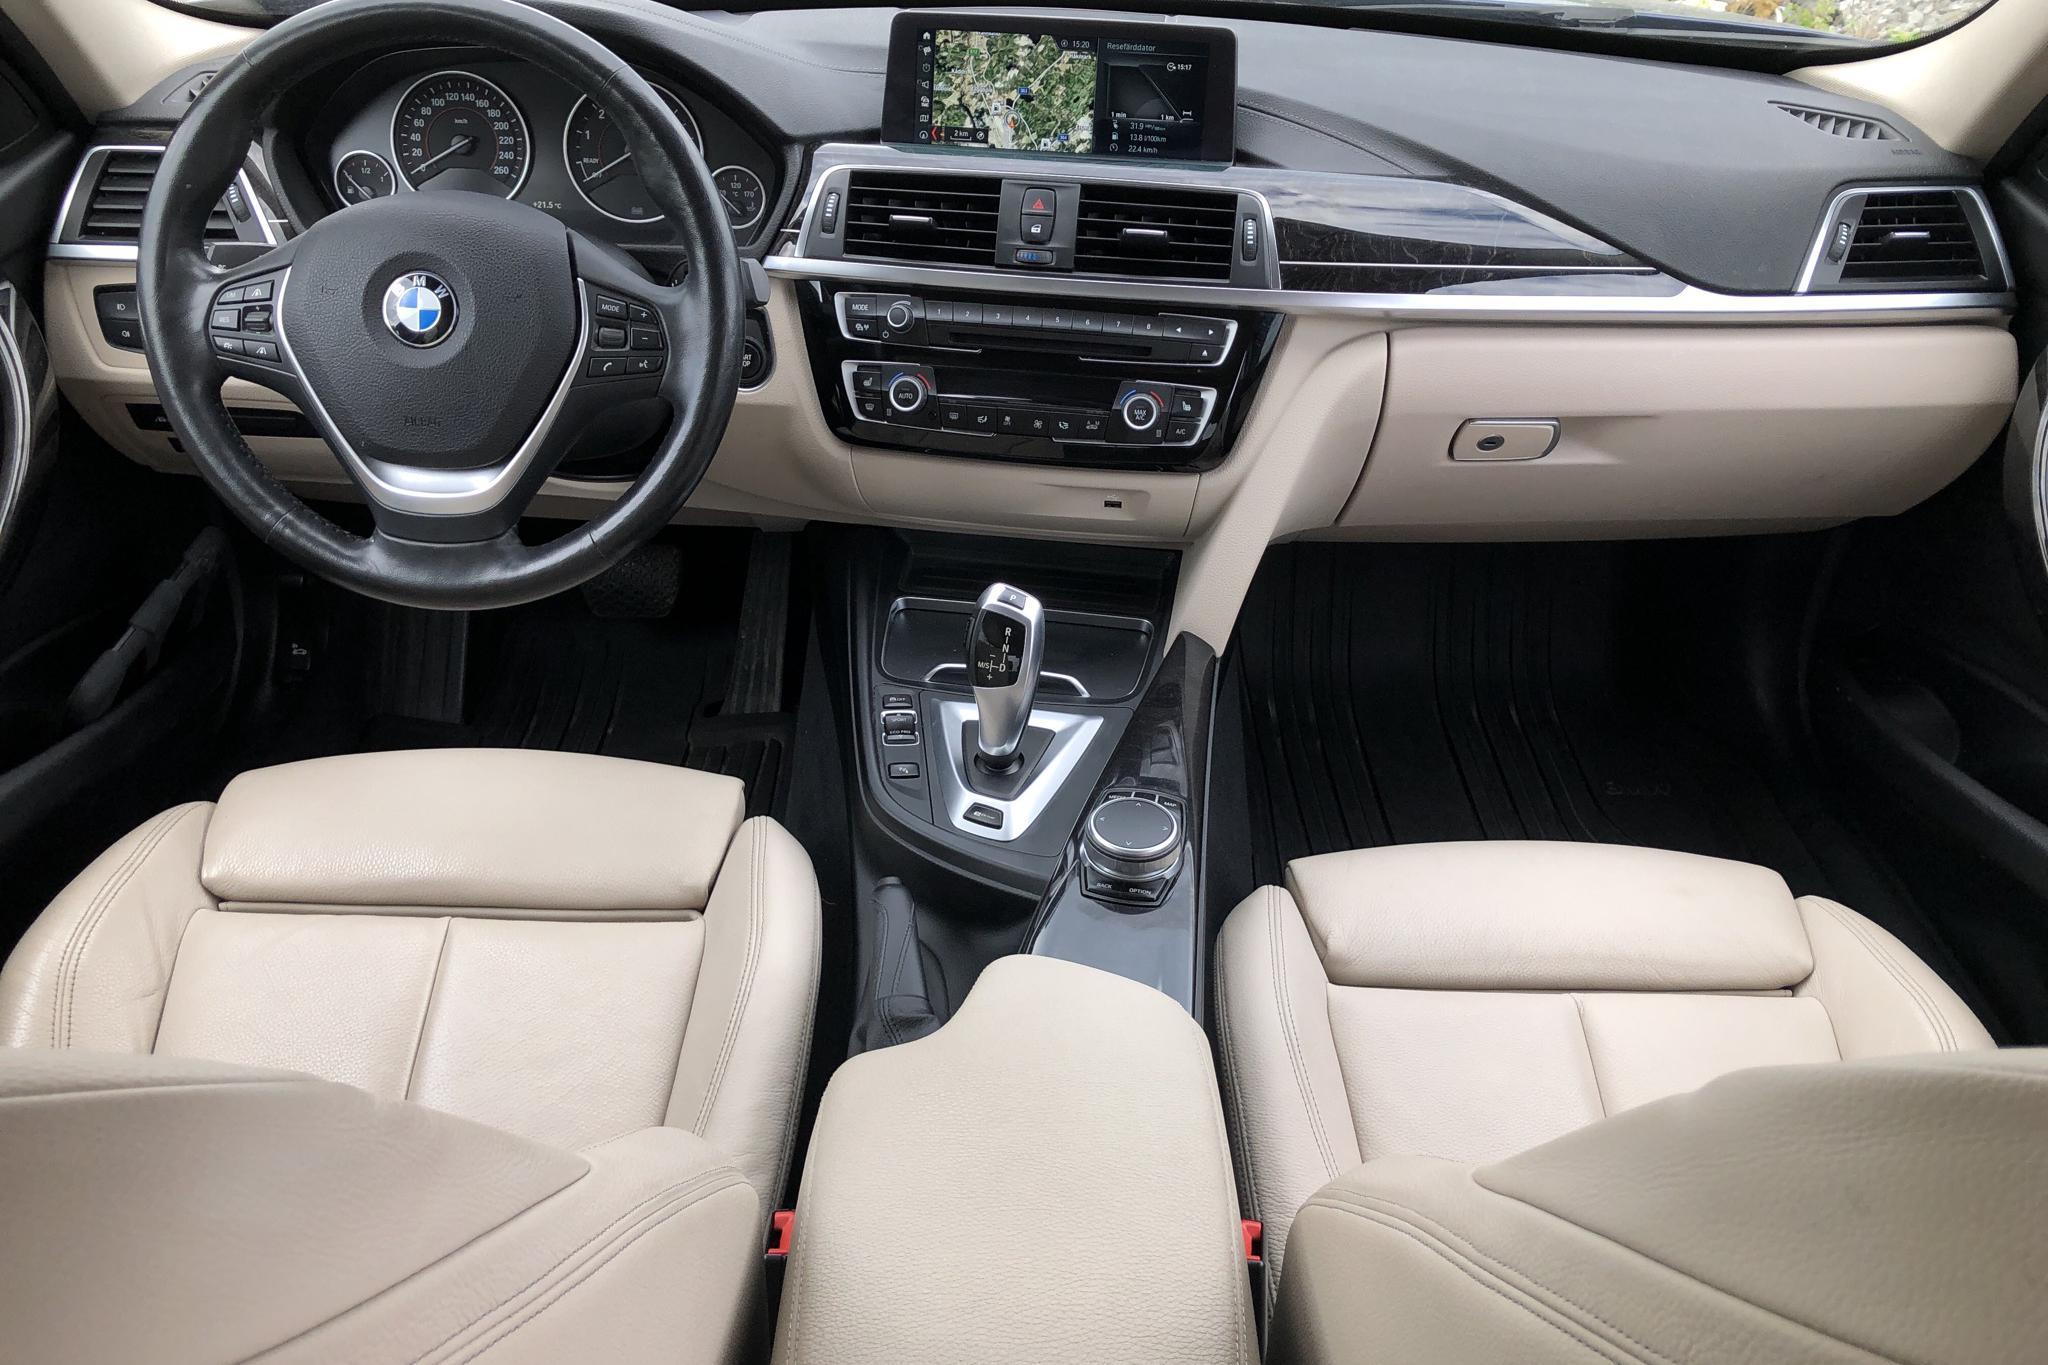 BMW 330e Sedan, F30 (252hk) - 99 870 km - Automatic - blue - 2018